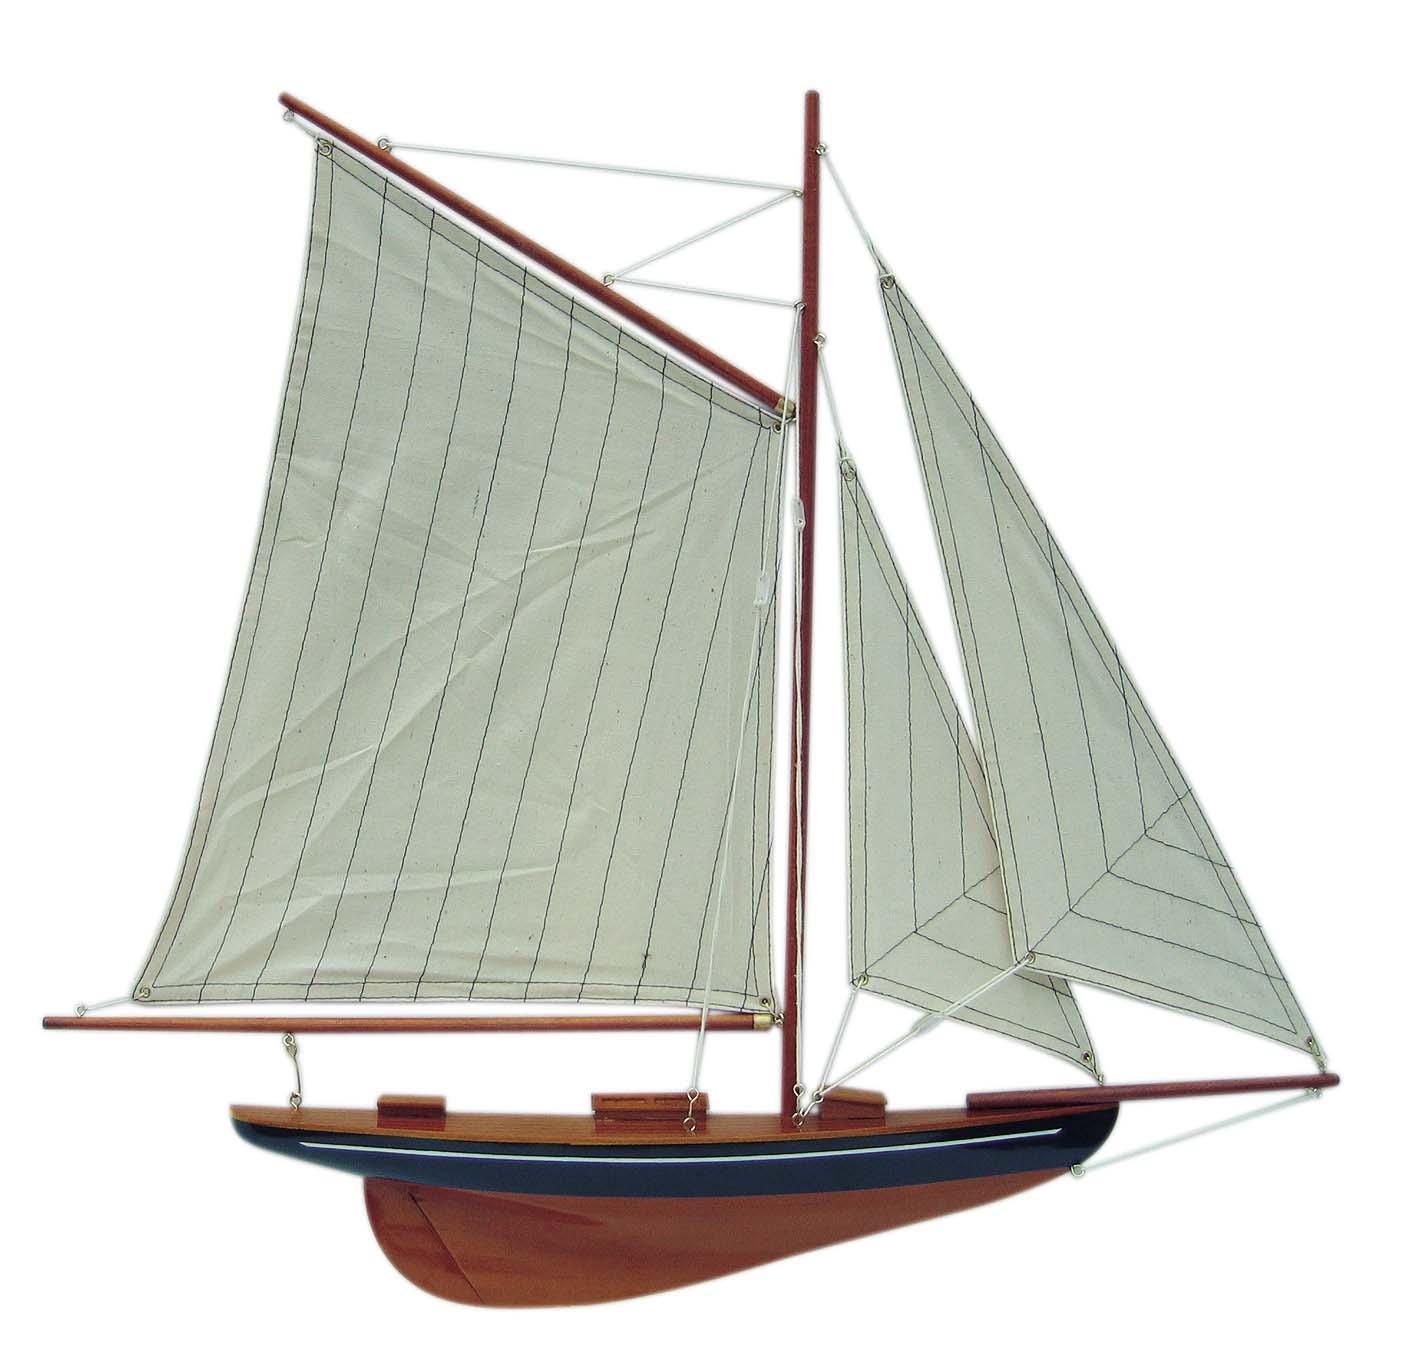 halbmodelle schiffe online kaufen mare me maritime dekoration geschenke. Black Bedroom Furniture Sets. Home Design Ideas